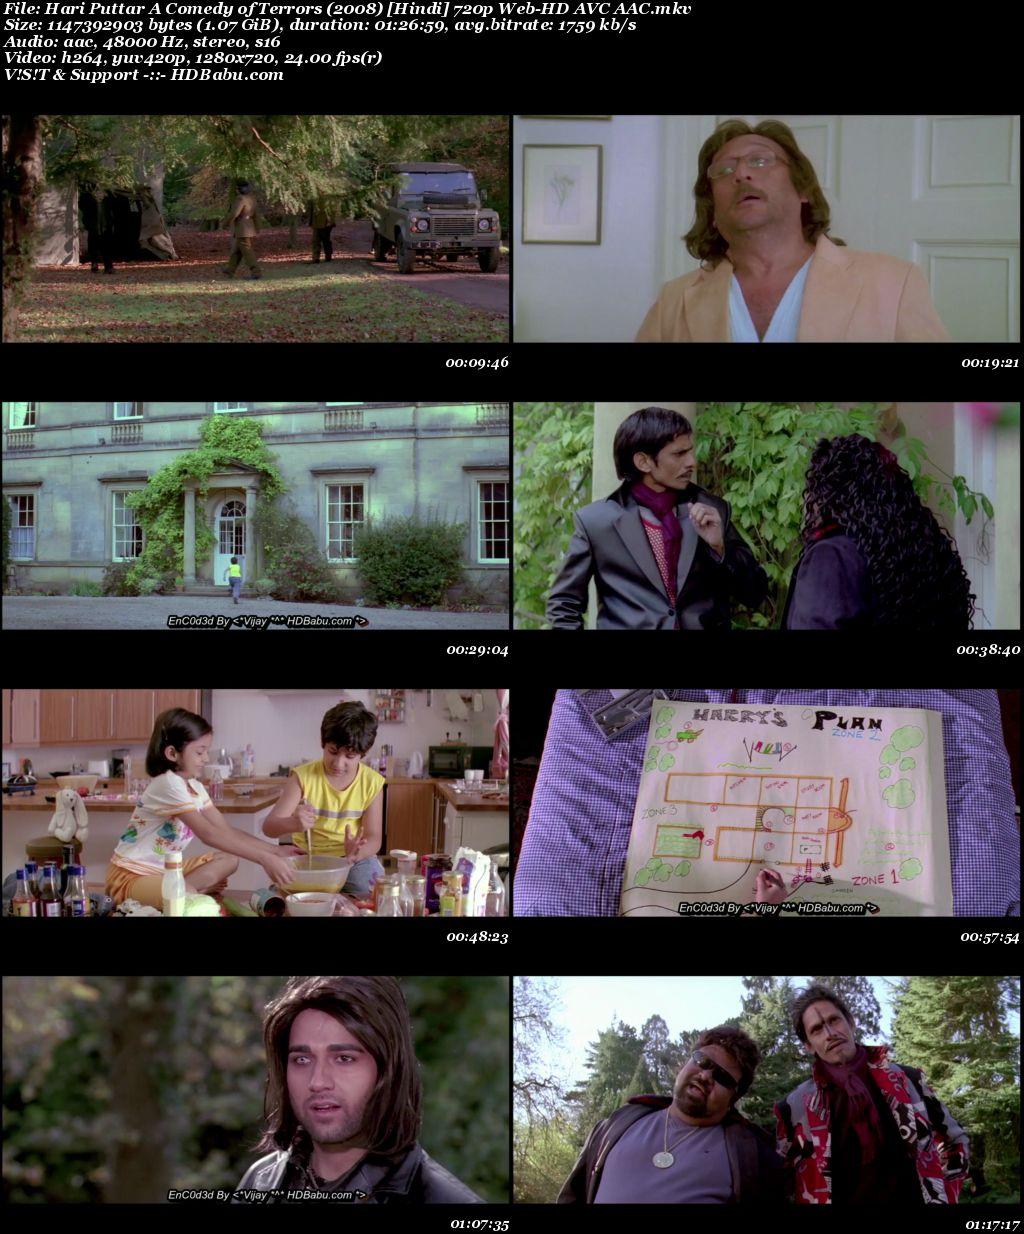 Hari Puttar Full Movie Download, Hari Puttar: A Comedy of Terrors (2008) Hindi full movie watch online 720p hd free, Hari Puttar: A Comedy of Terrors  hd full movie 720p blu-ray download.